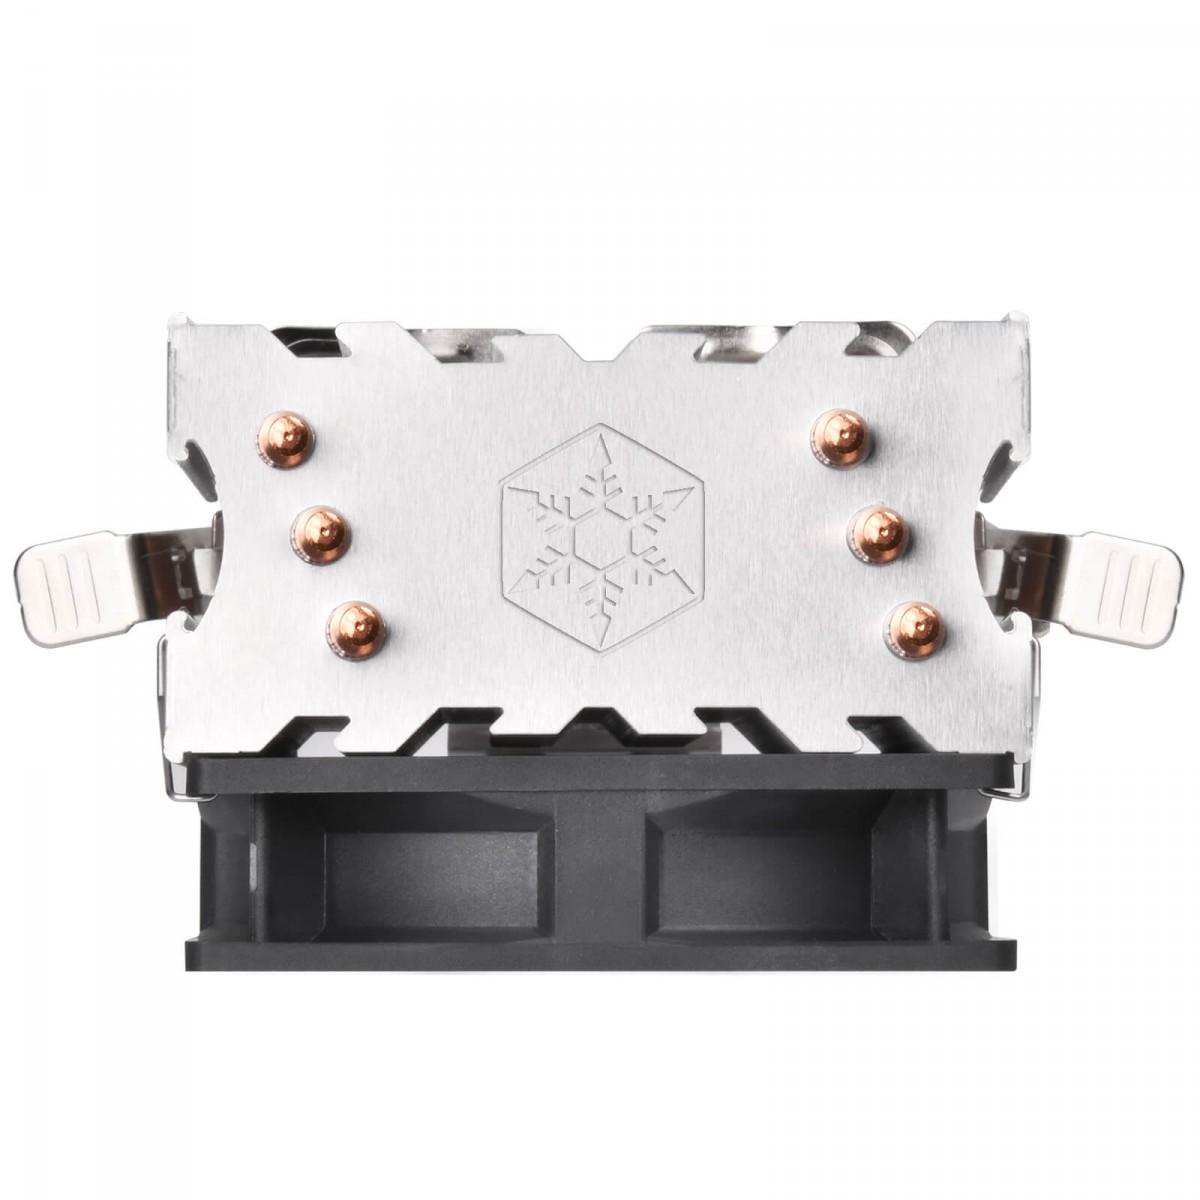 Cooler para Processador SilverStone KR02, 92mm, Intel-AMD, SST-KR02